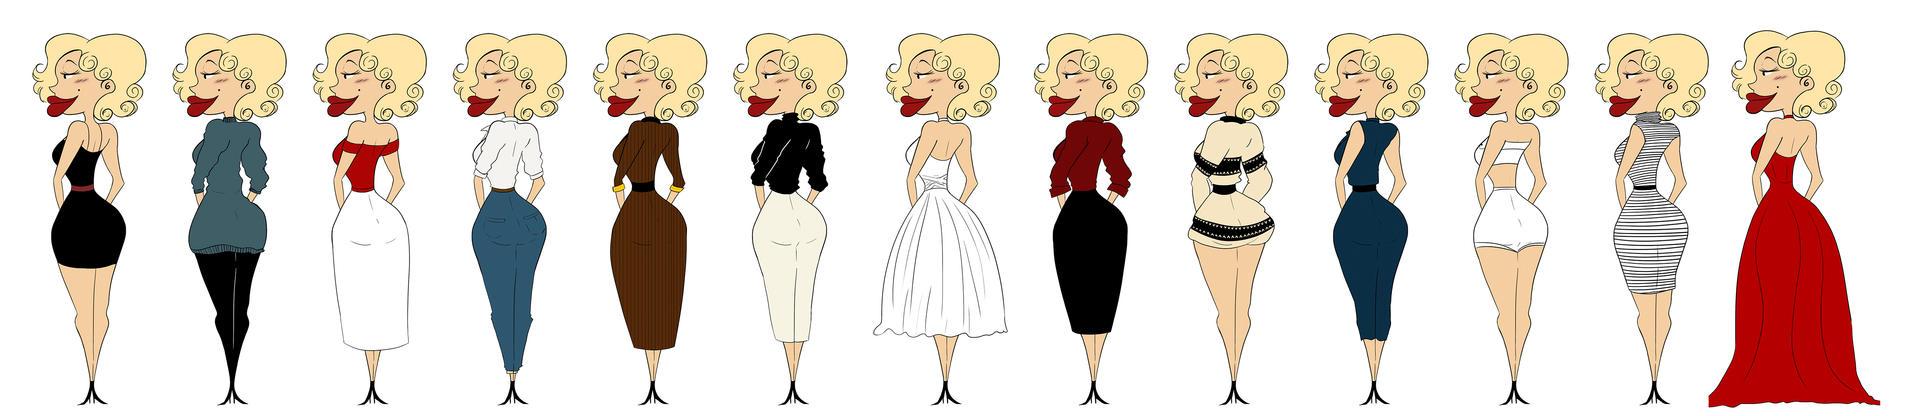 Marilyn Monroe - Style icon by MariChan27